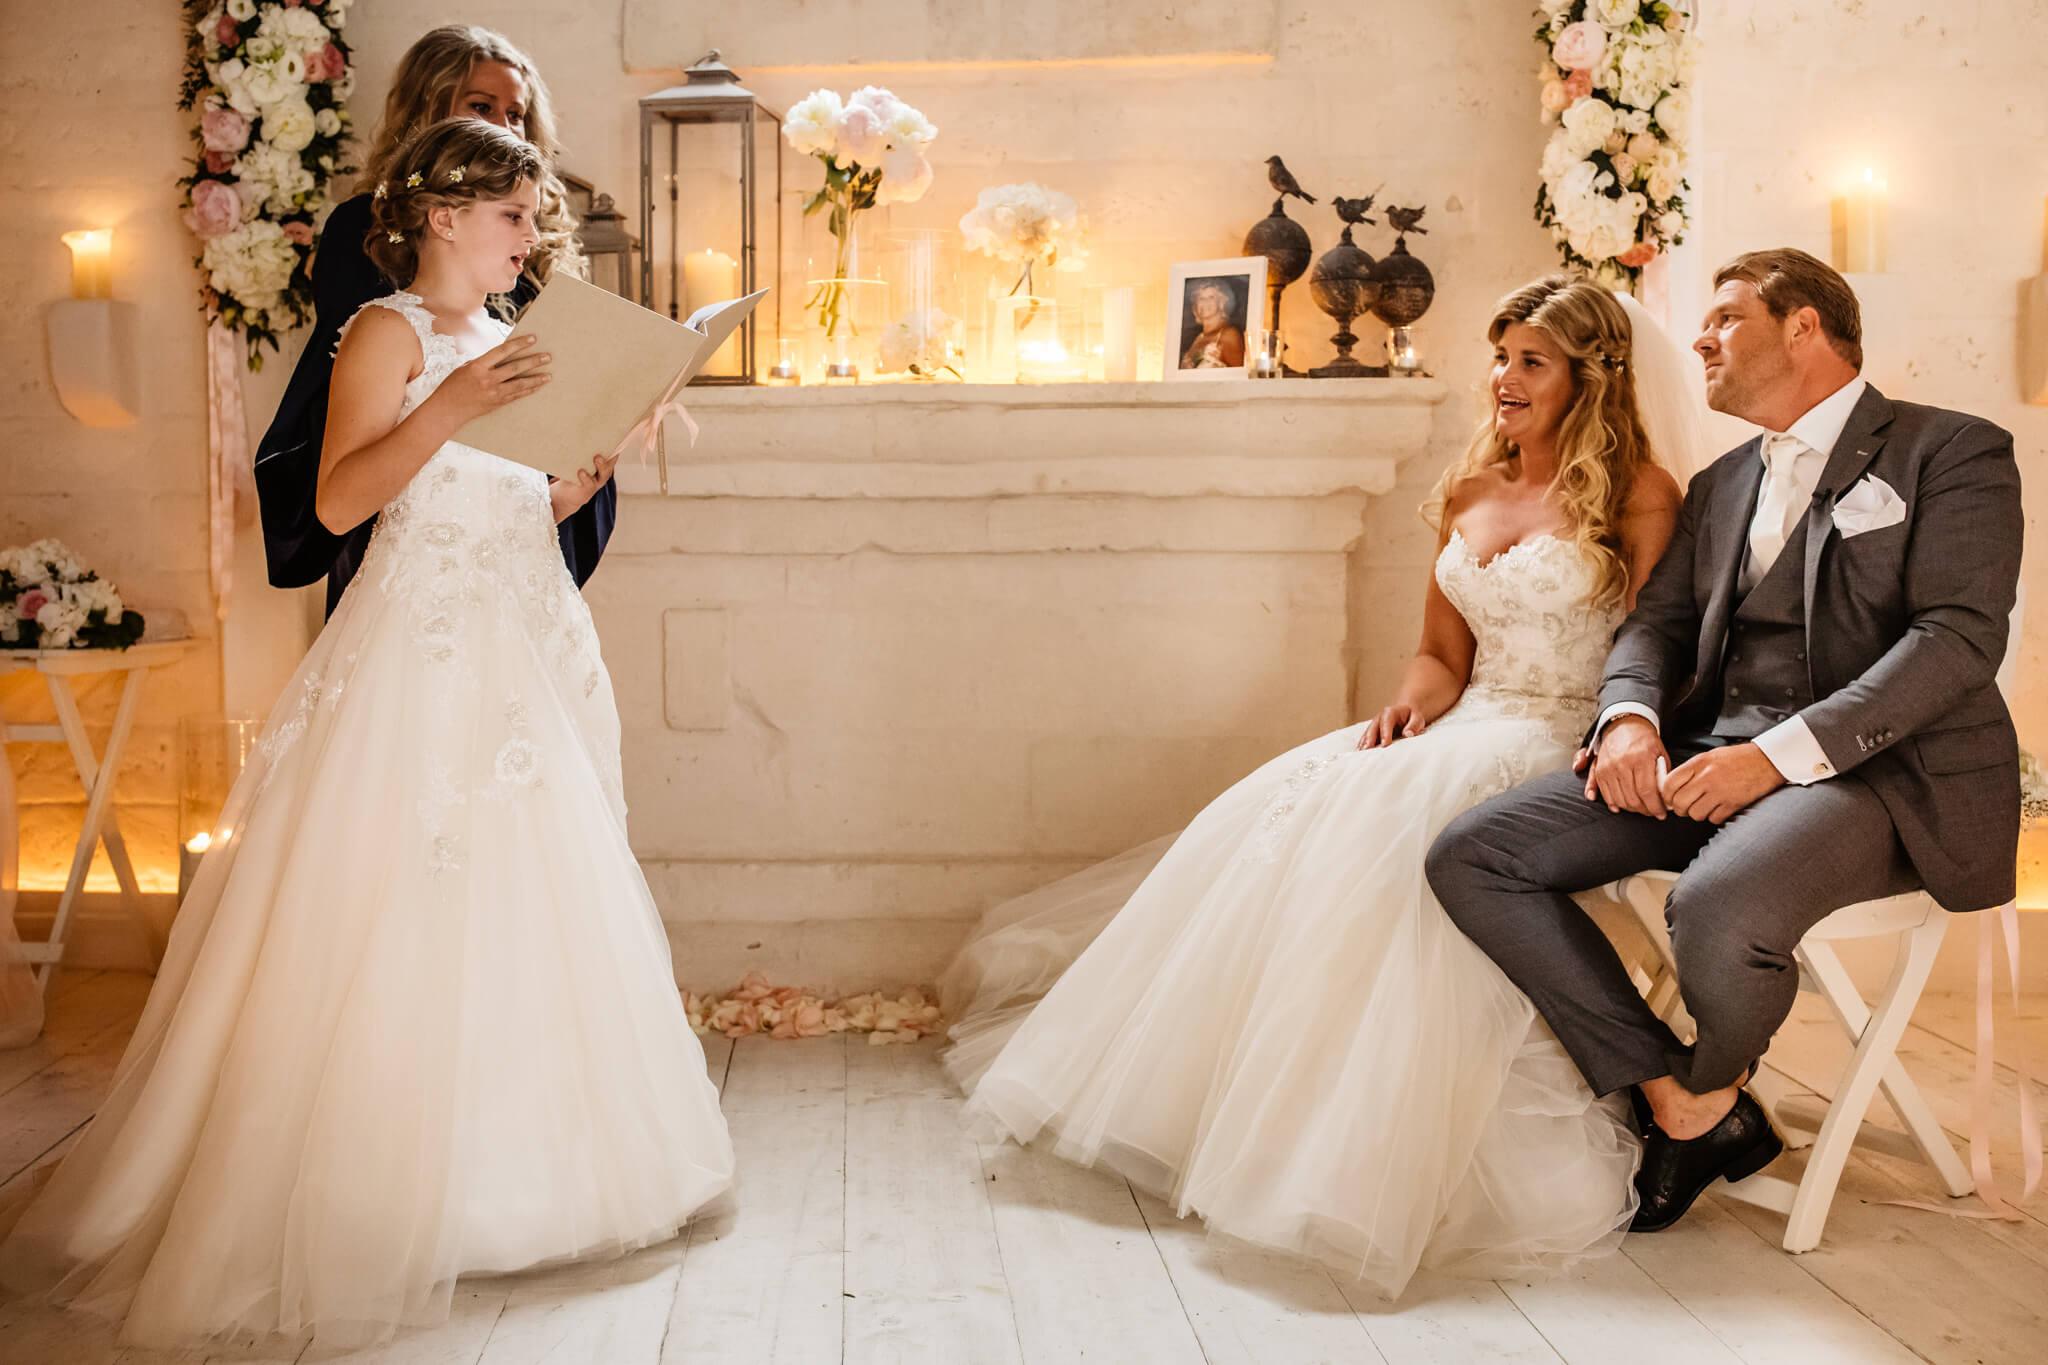 destination-wedding-italy-puglia-22.jpg